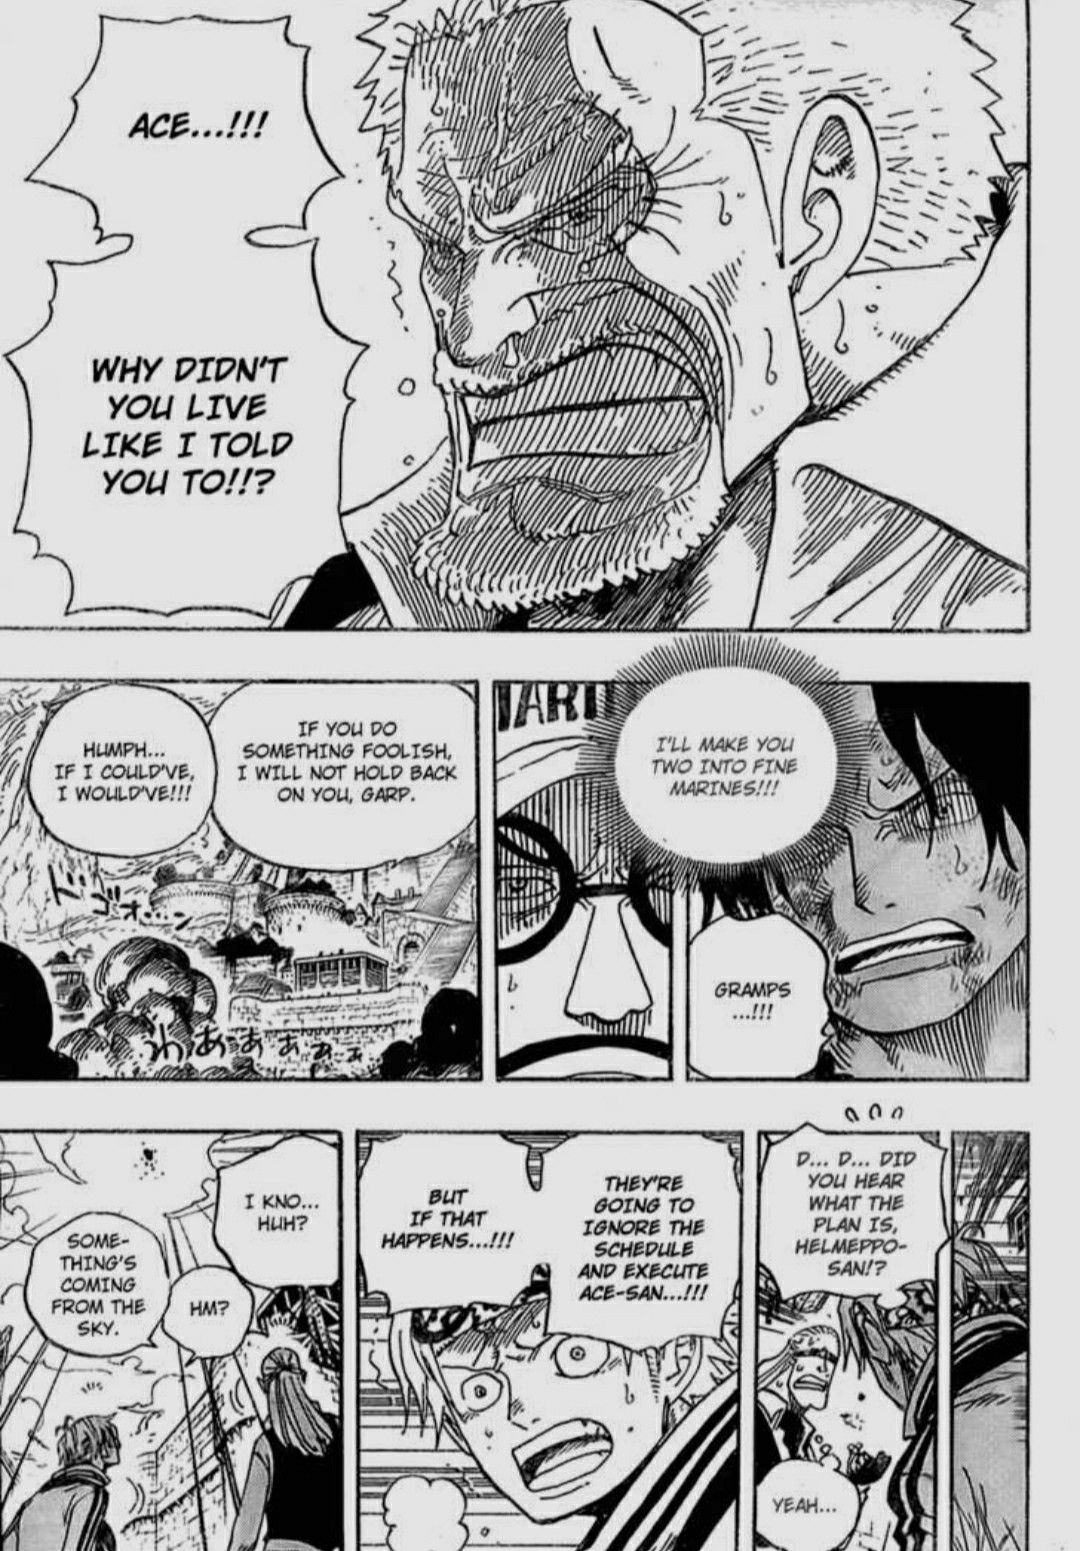 Pin By Niji On Manga Screenshots One Piece Manga One Piece Chapter One Piece Anime